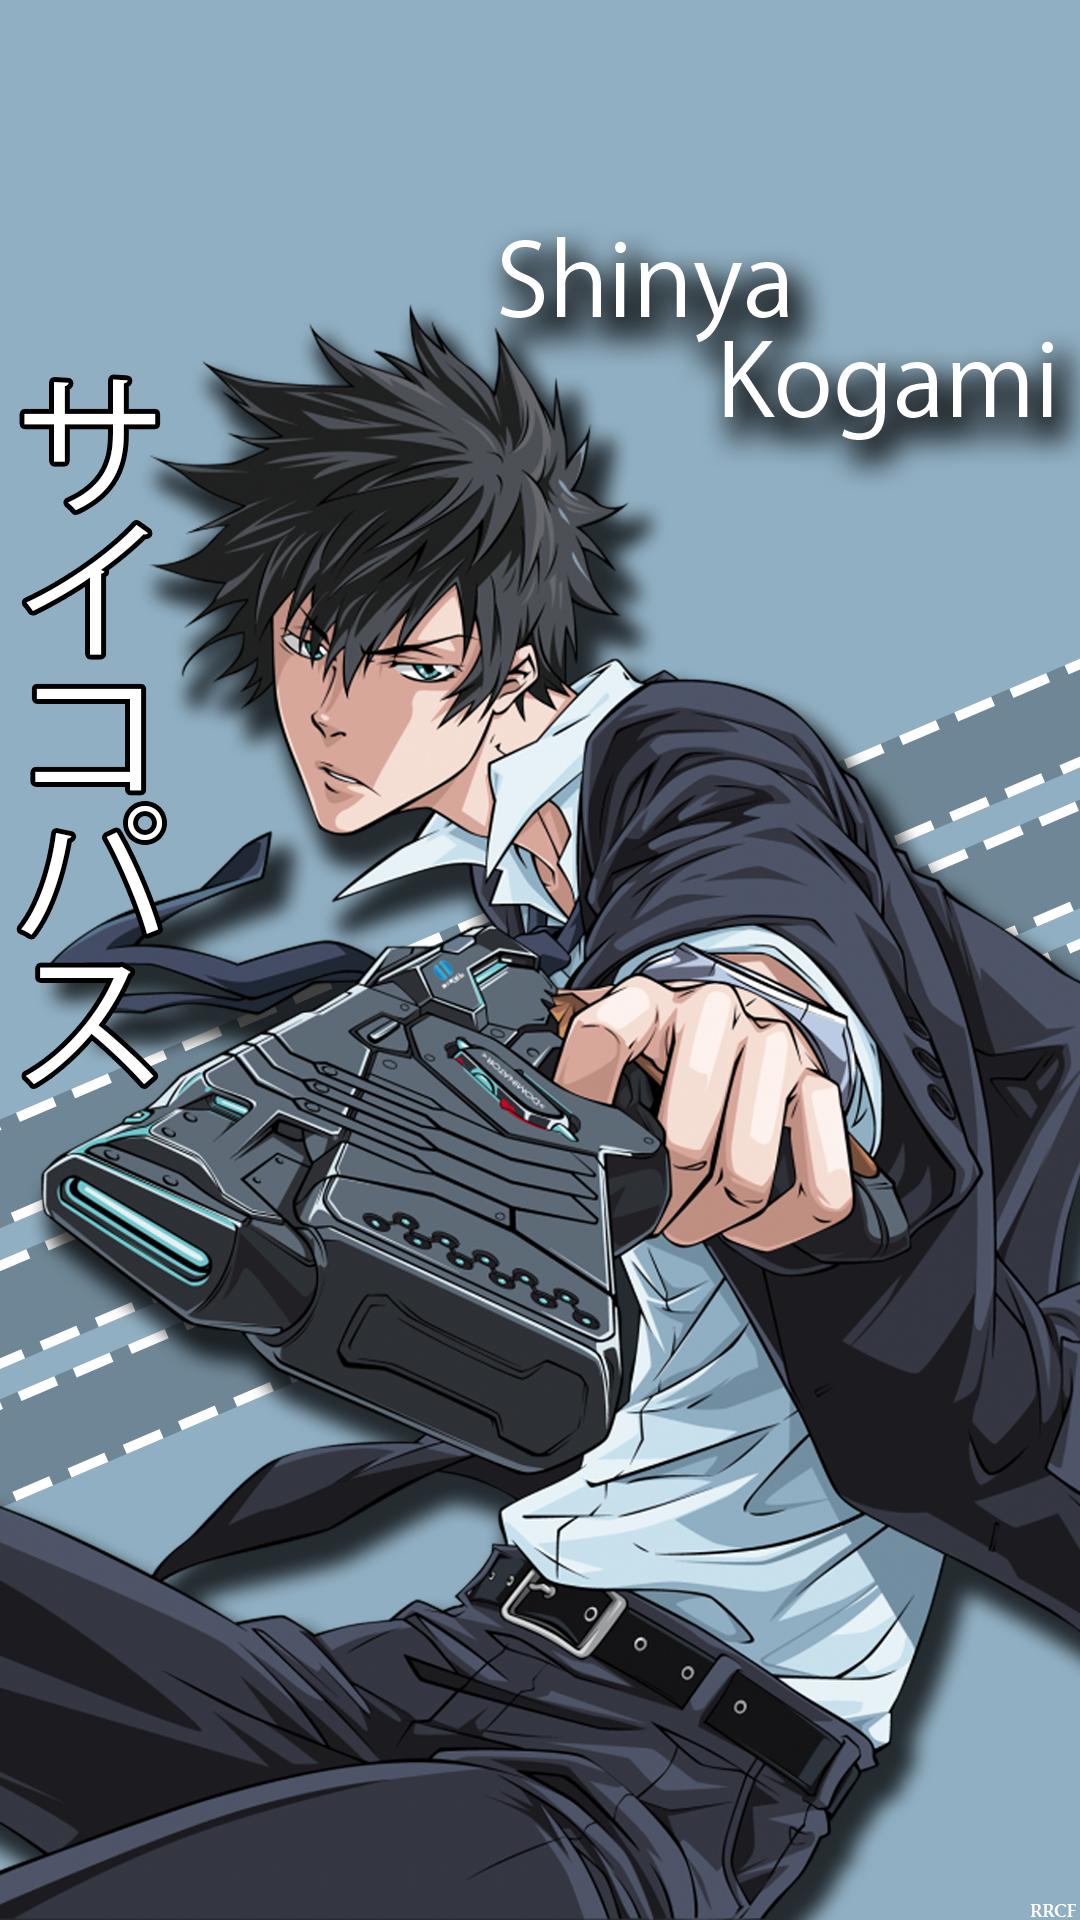 Anime Boy Psycho Pass Anime Anime Boy